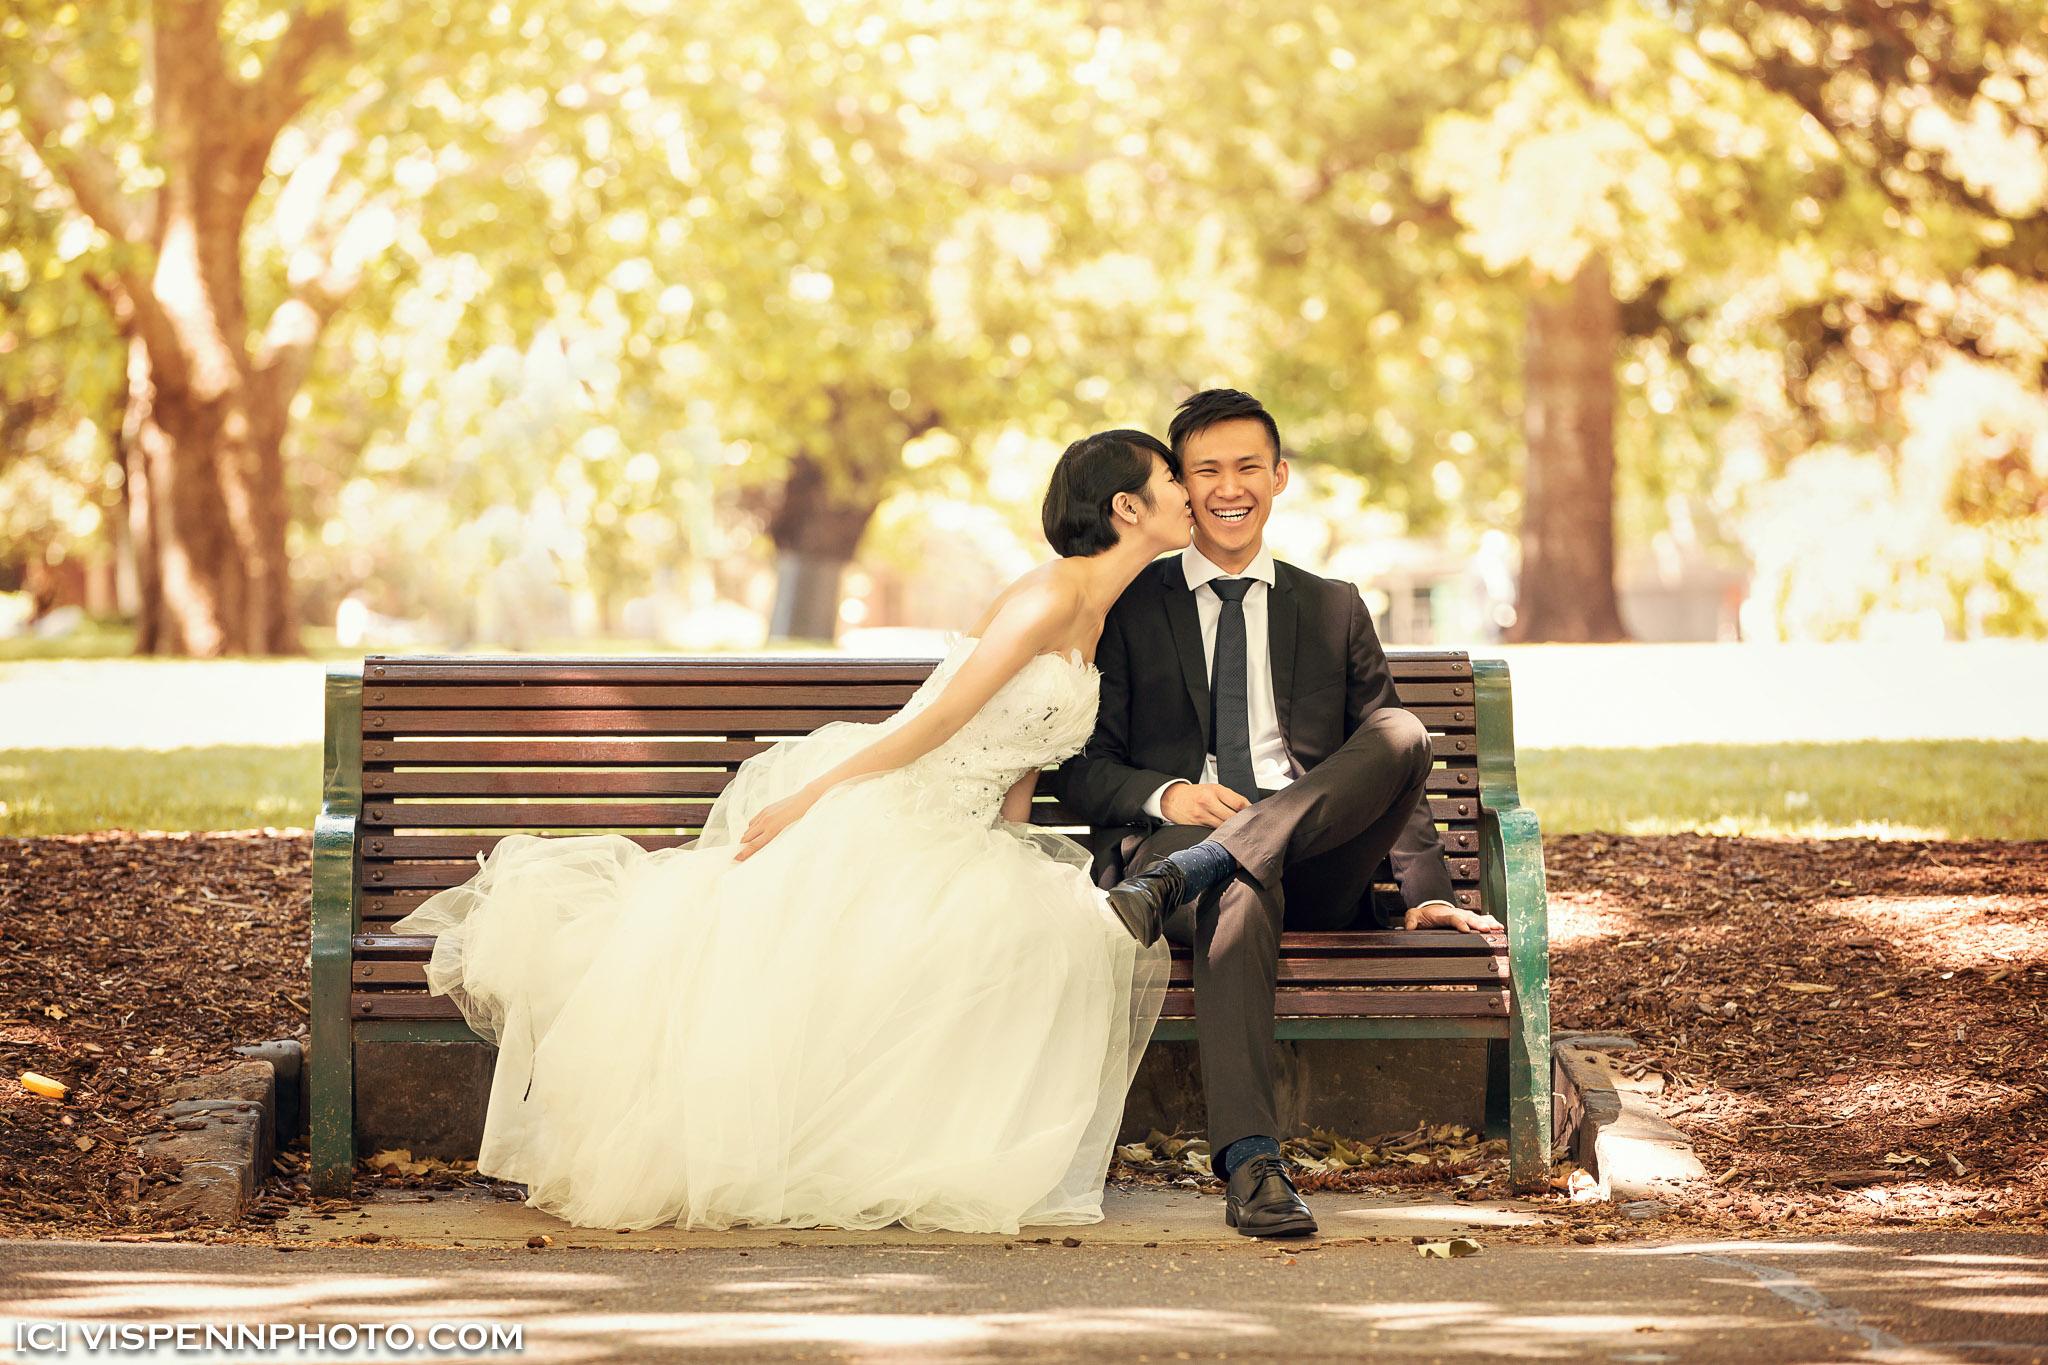 PRE WEDDING Photography Melbourne VISPENN 墨尔本 婚纱照 结婚照 婚纱摄影 Ivy PreWedding 1724